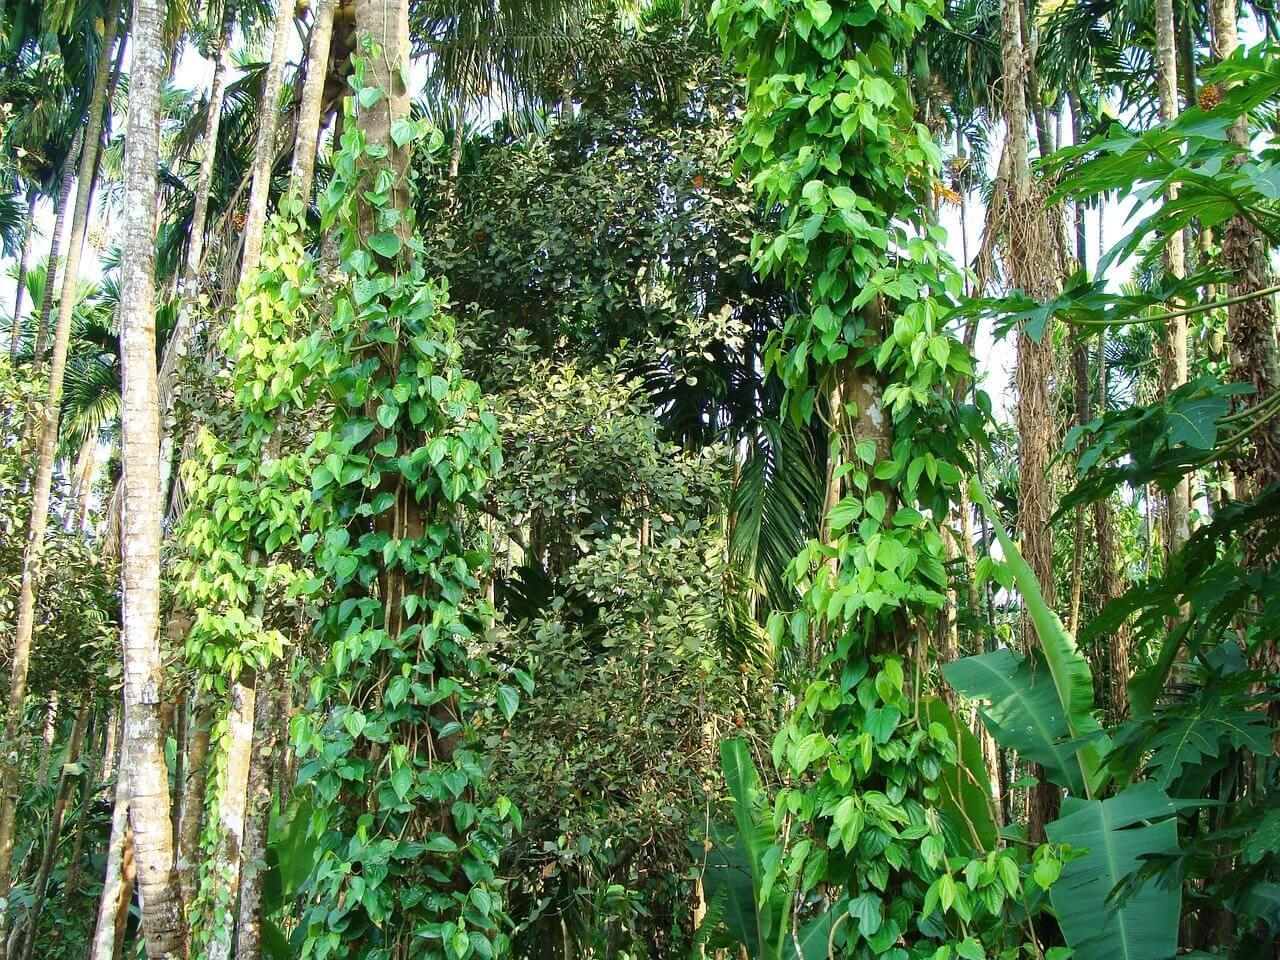 Fekete bors (Piper nigrum)